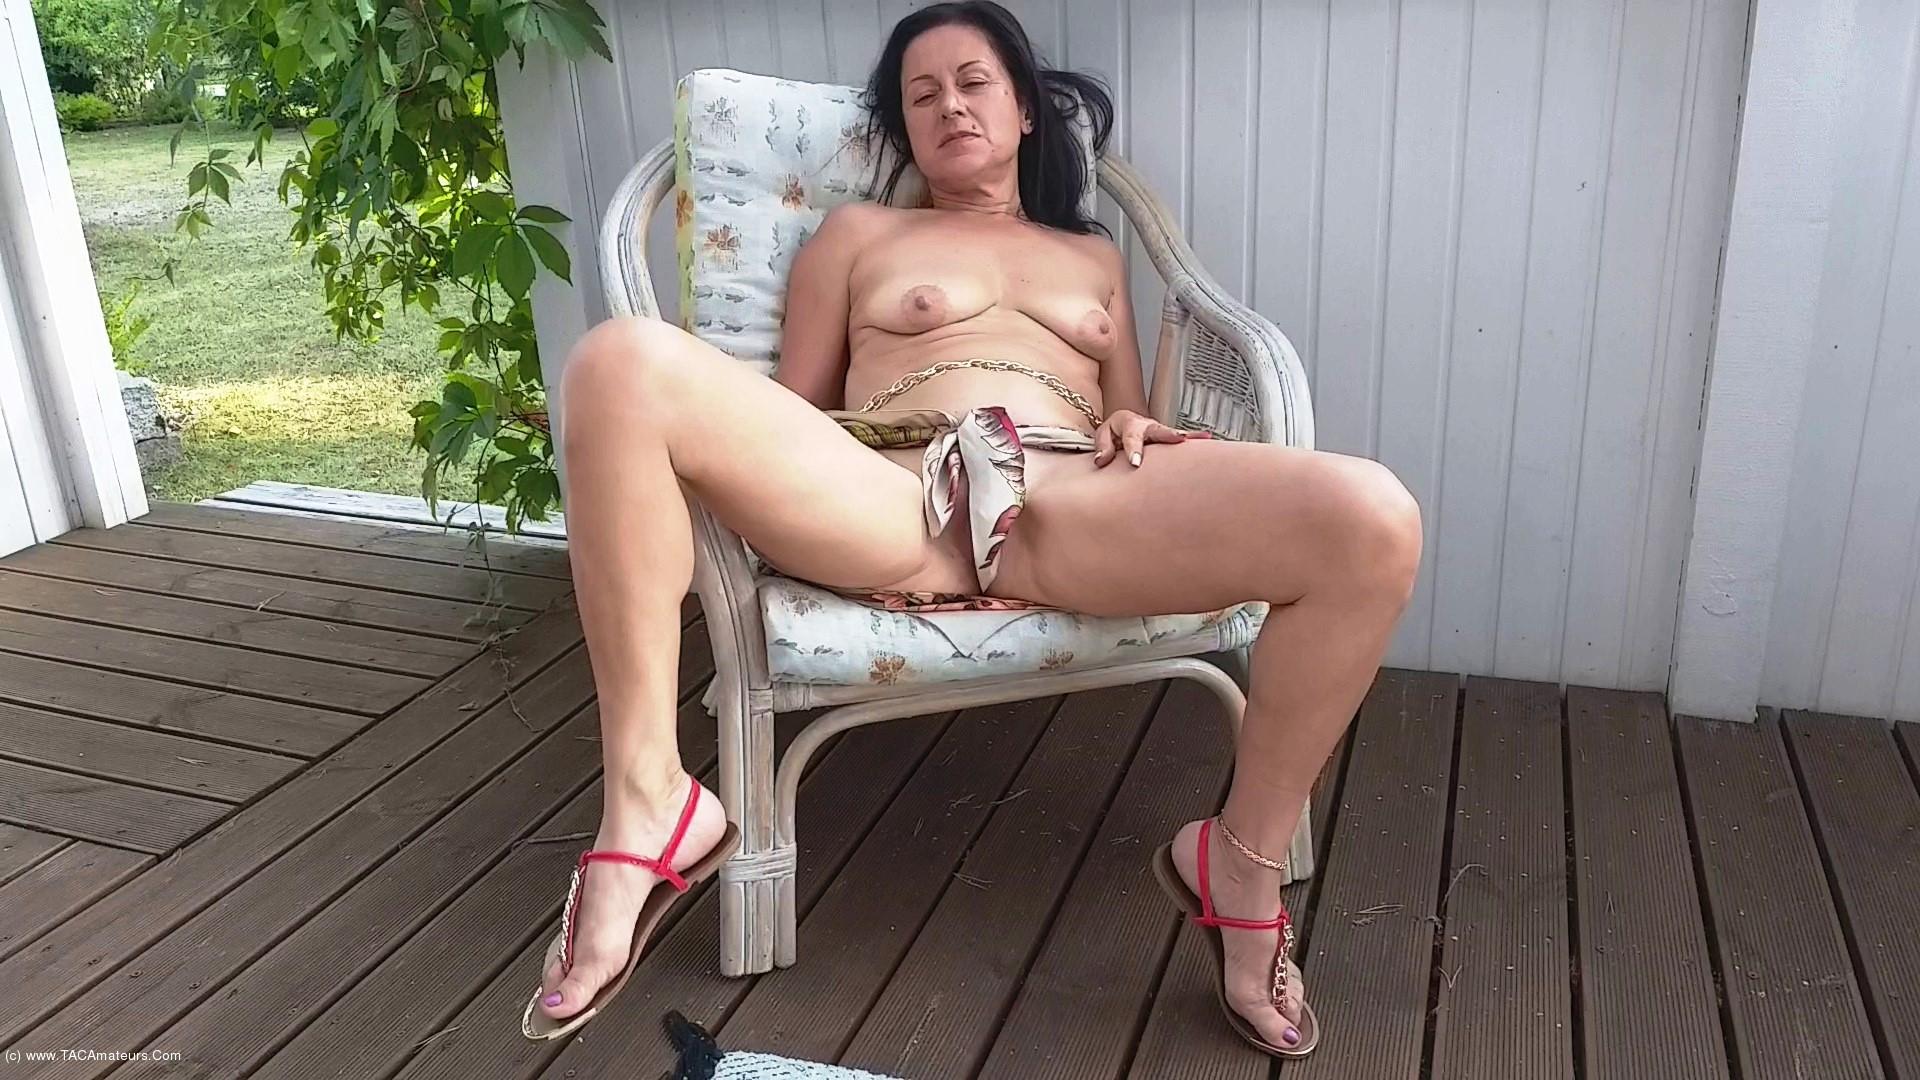 DianaAnanta - Outdoor Masturbation scene 0